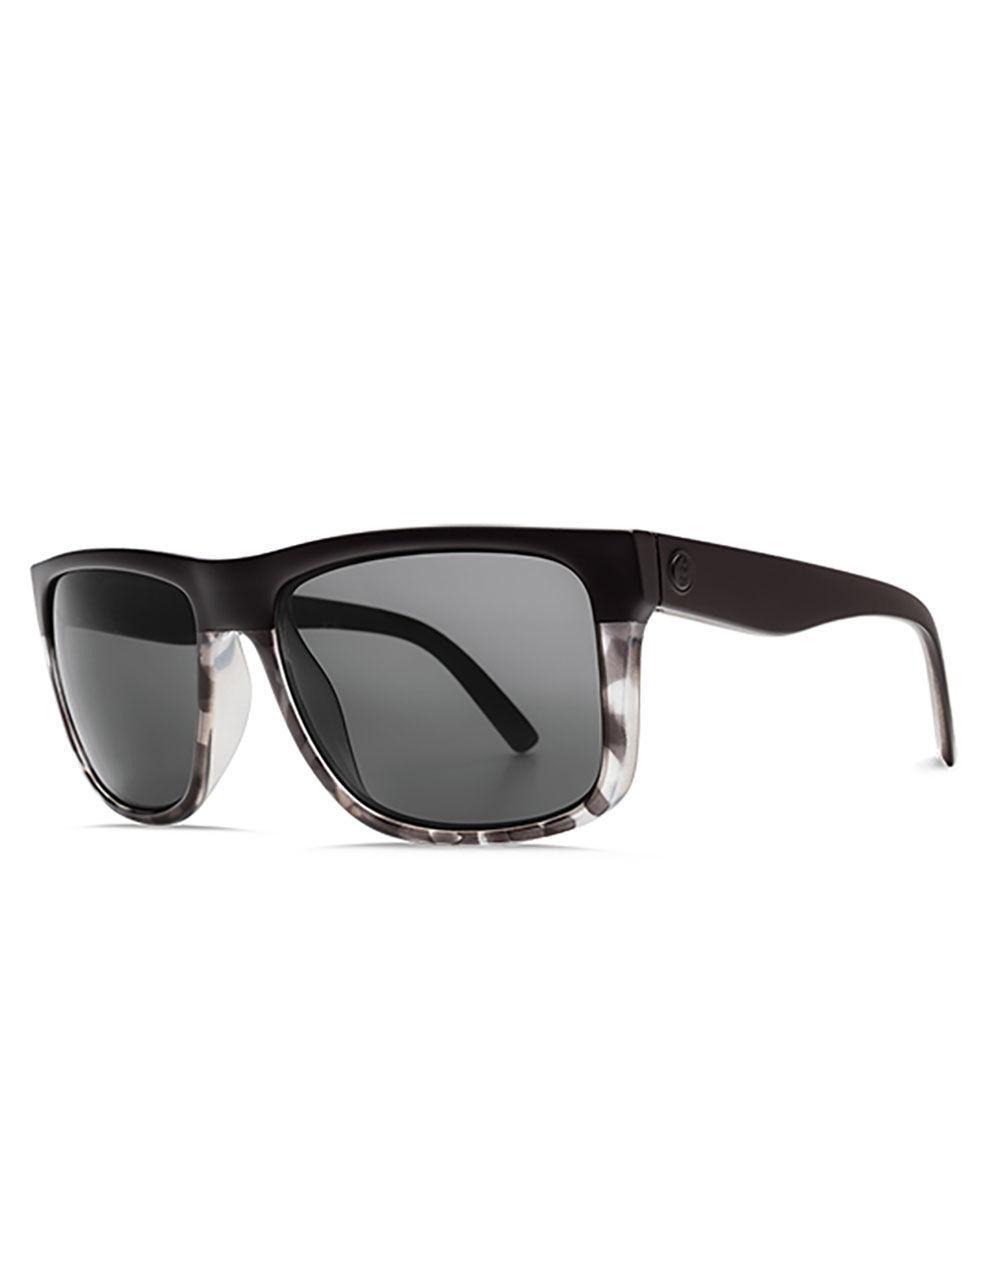 9759f1124527 Lyst - Electric Swingarm Xl Darkstone Polarized Sunglasses in Gray ...